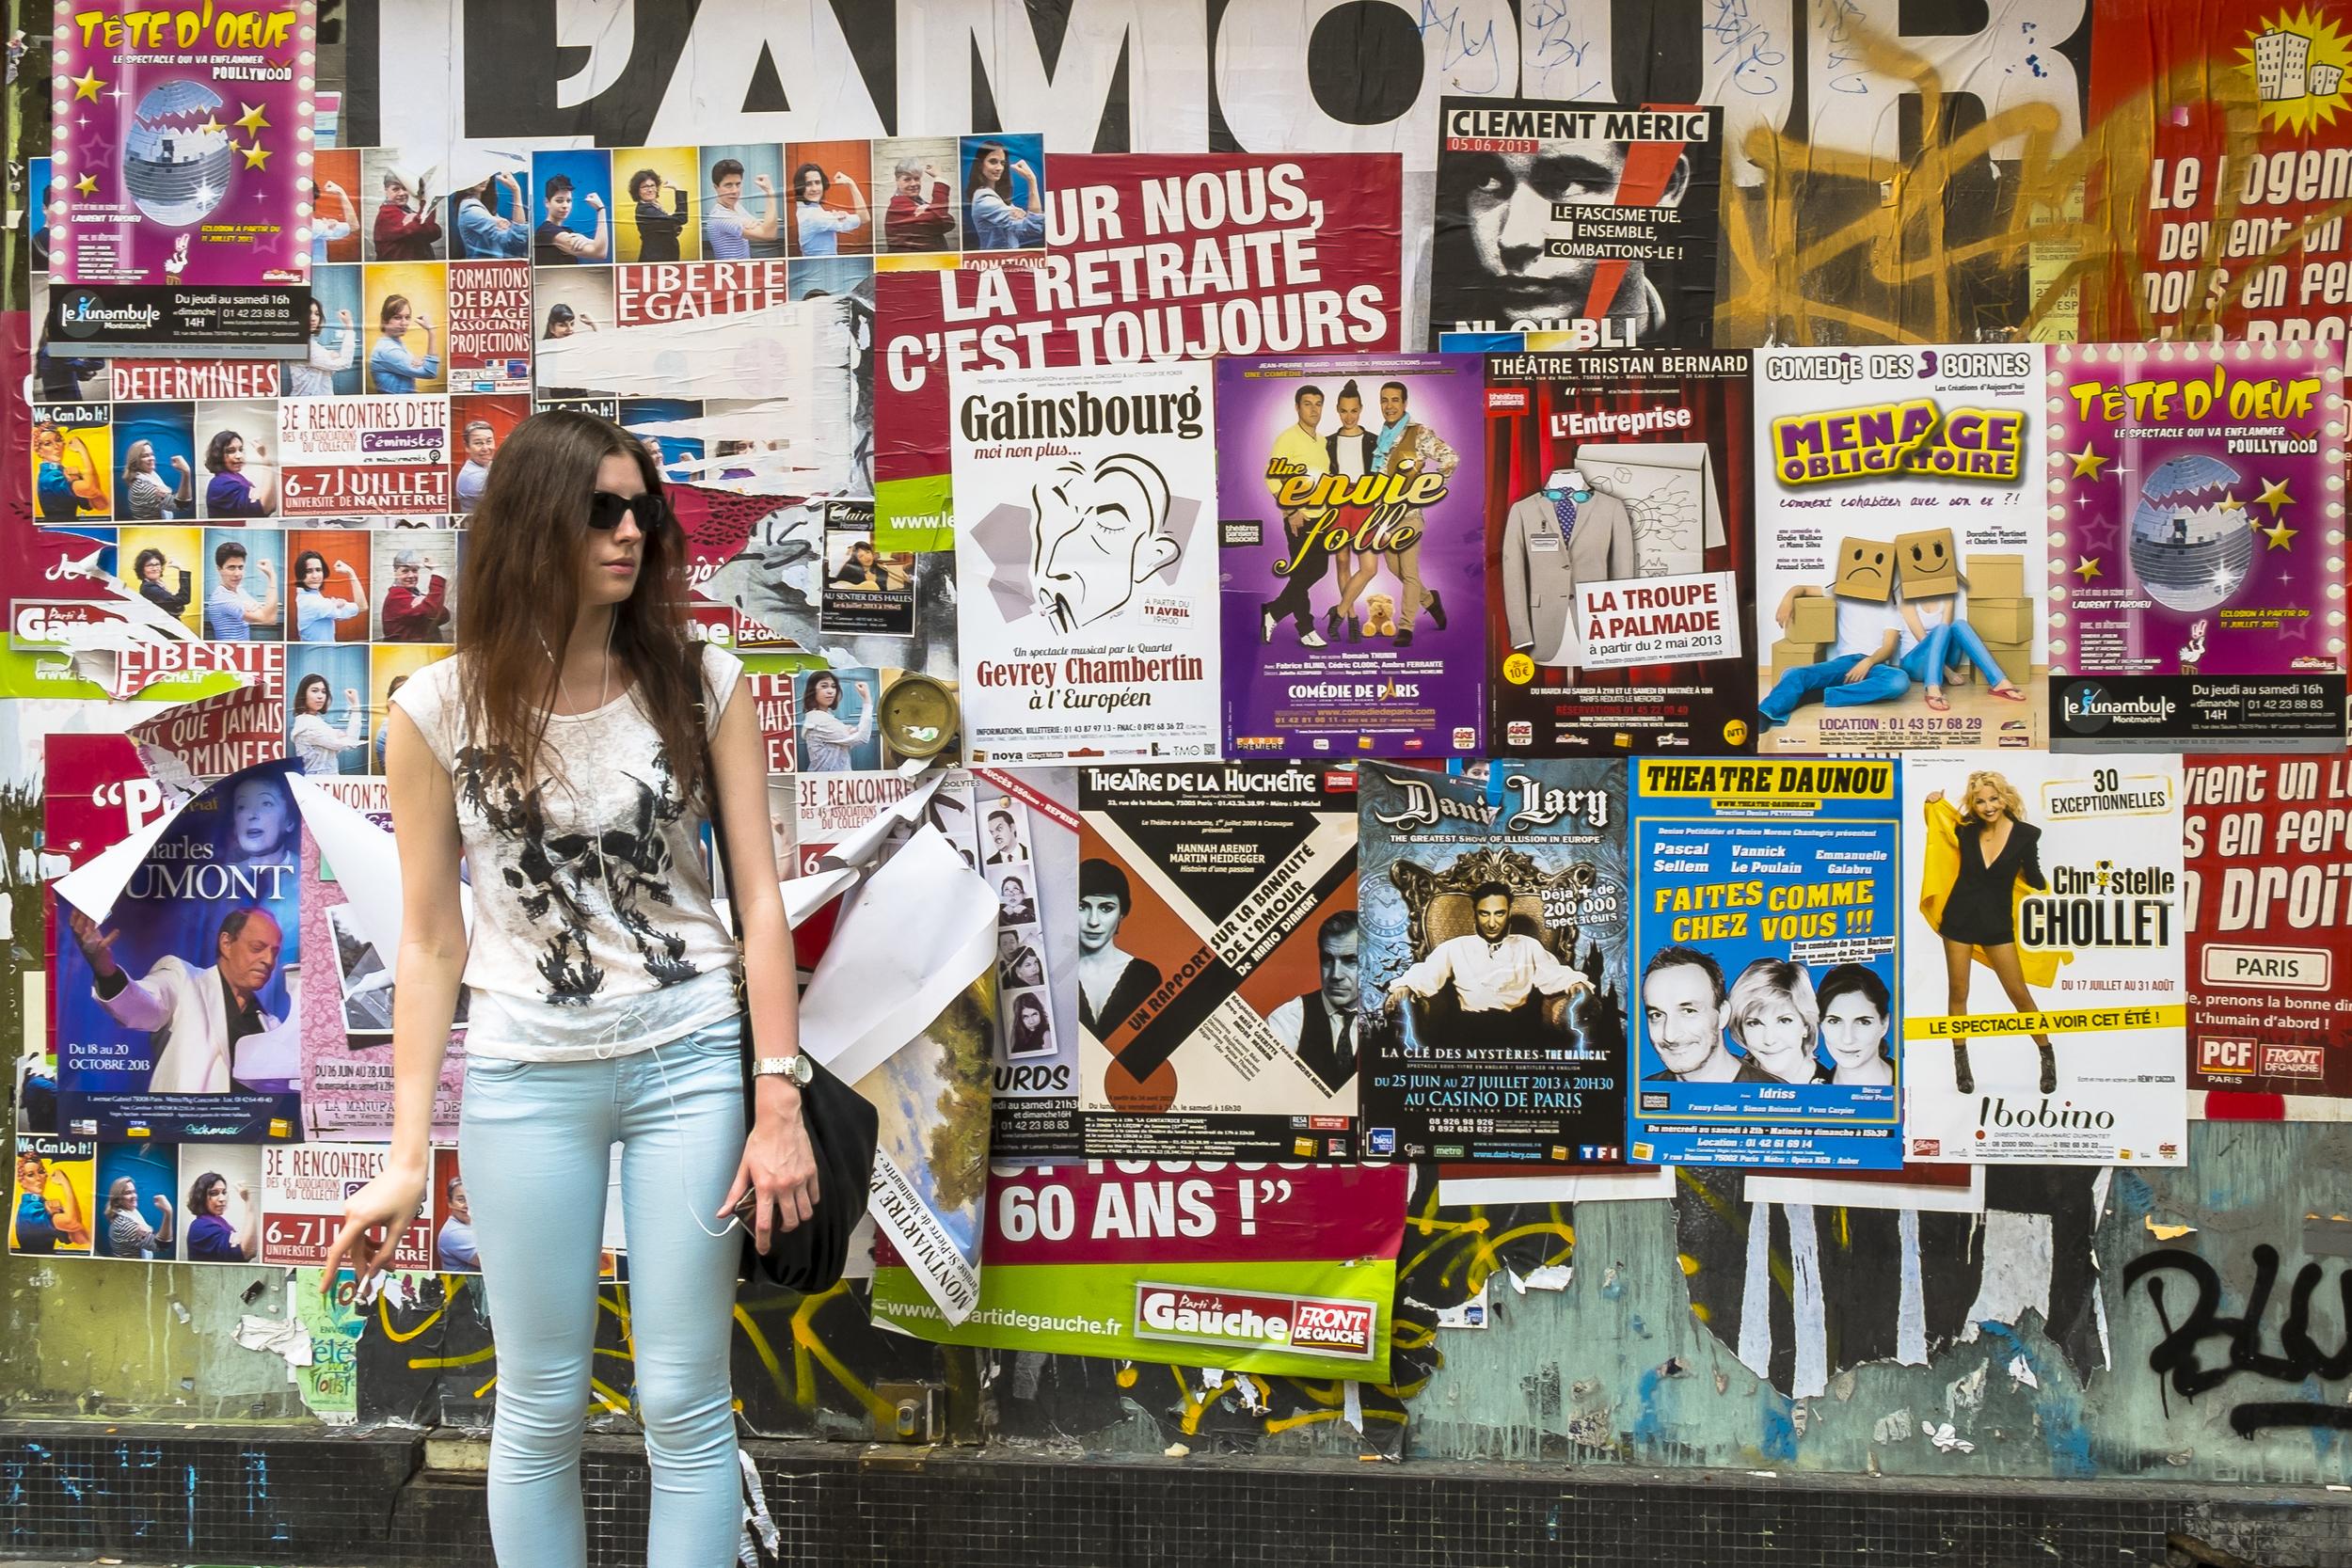 Paris-L'AmourMontmartre-20130707-DSCF3648.jpg